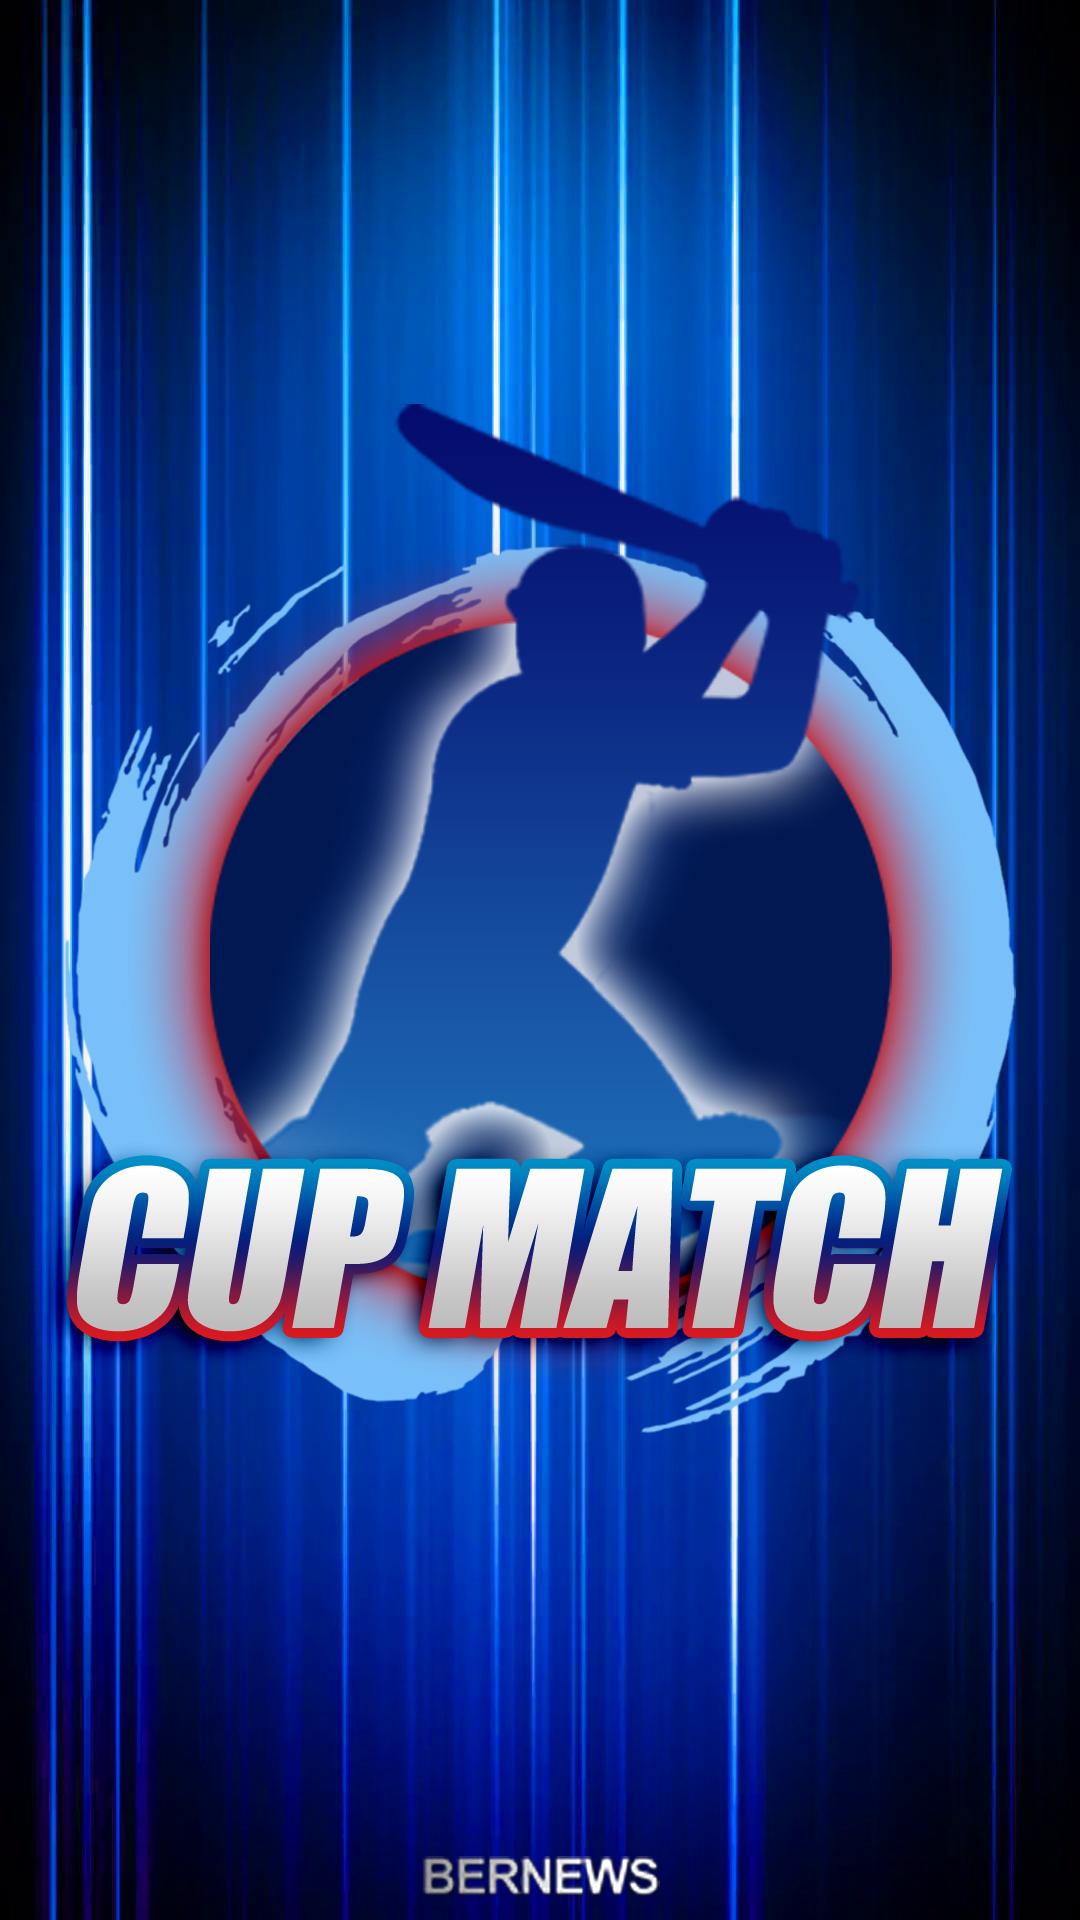 cupmatch wallpaper phone 2384282